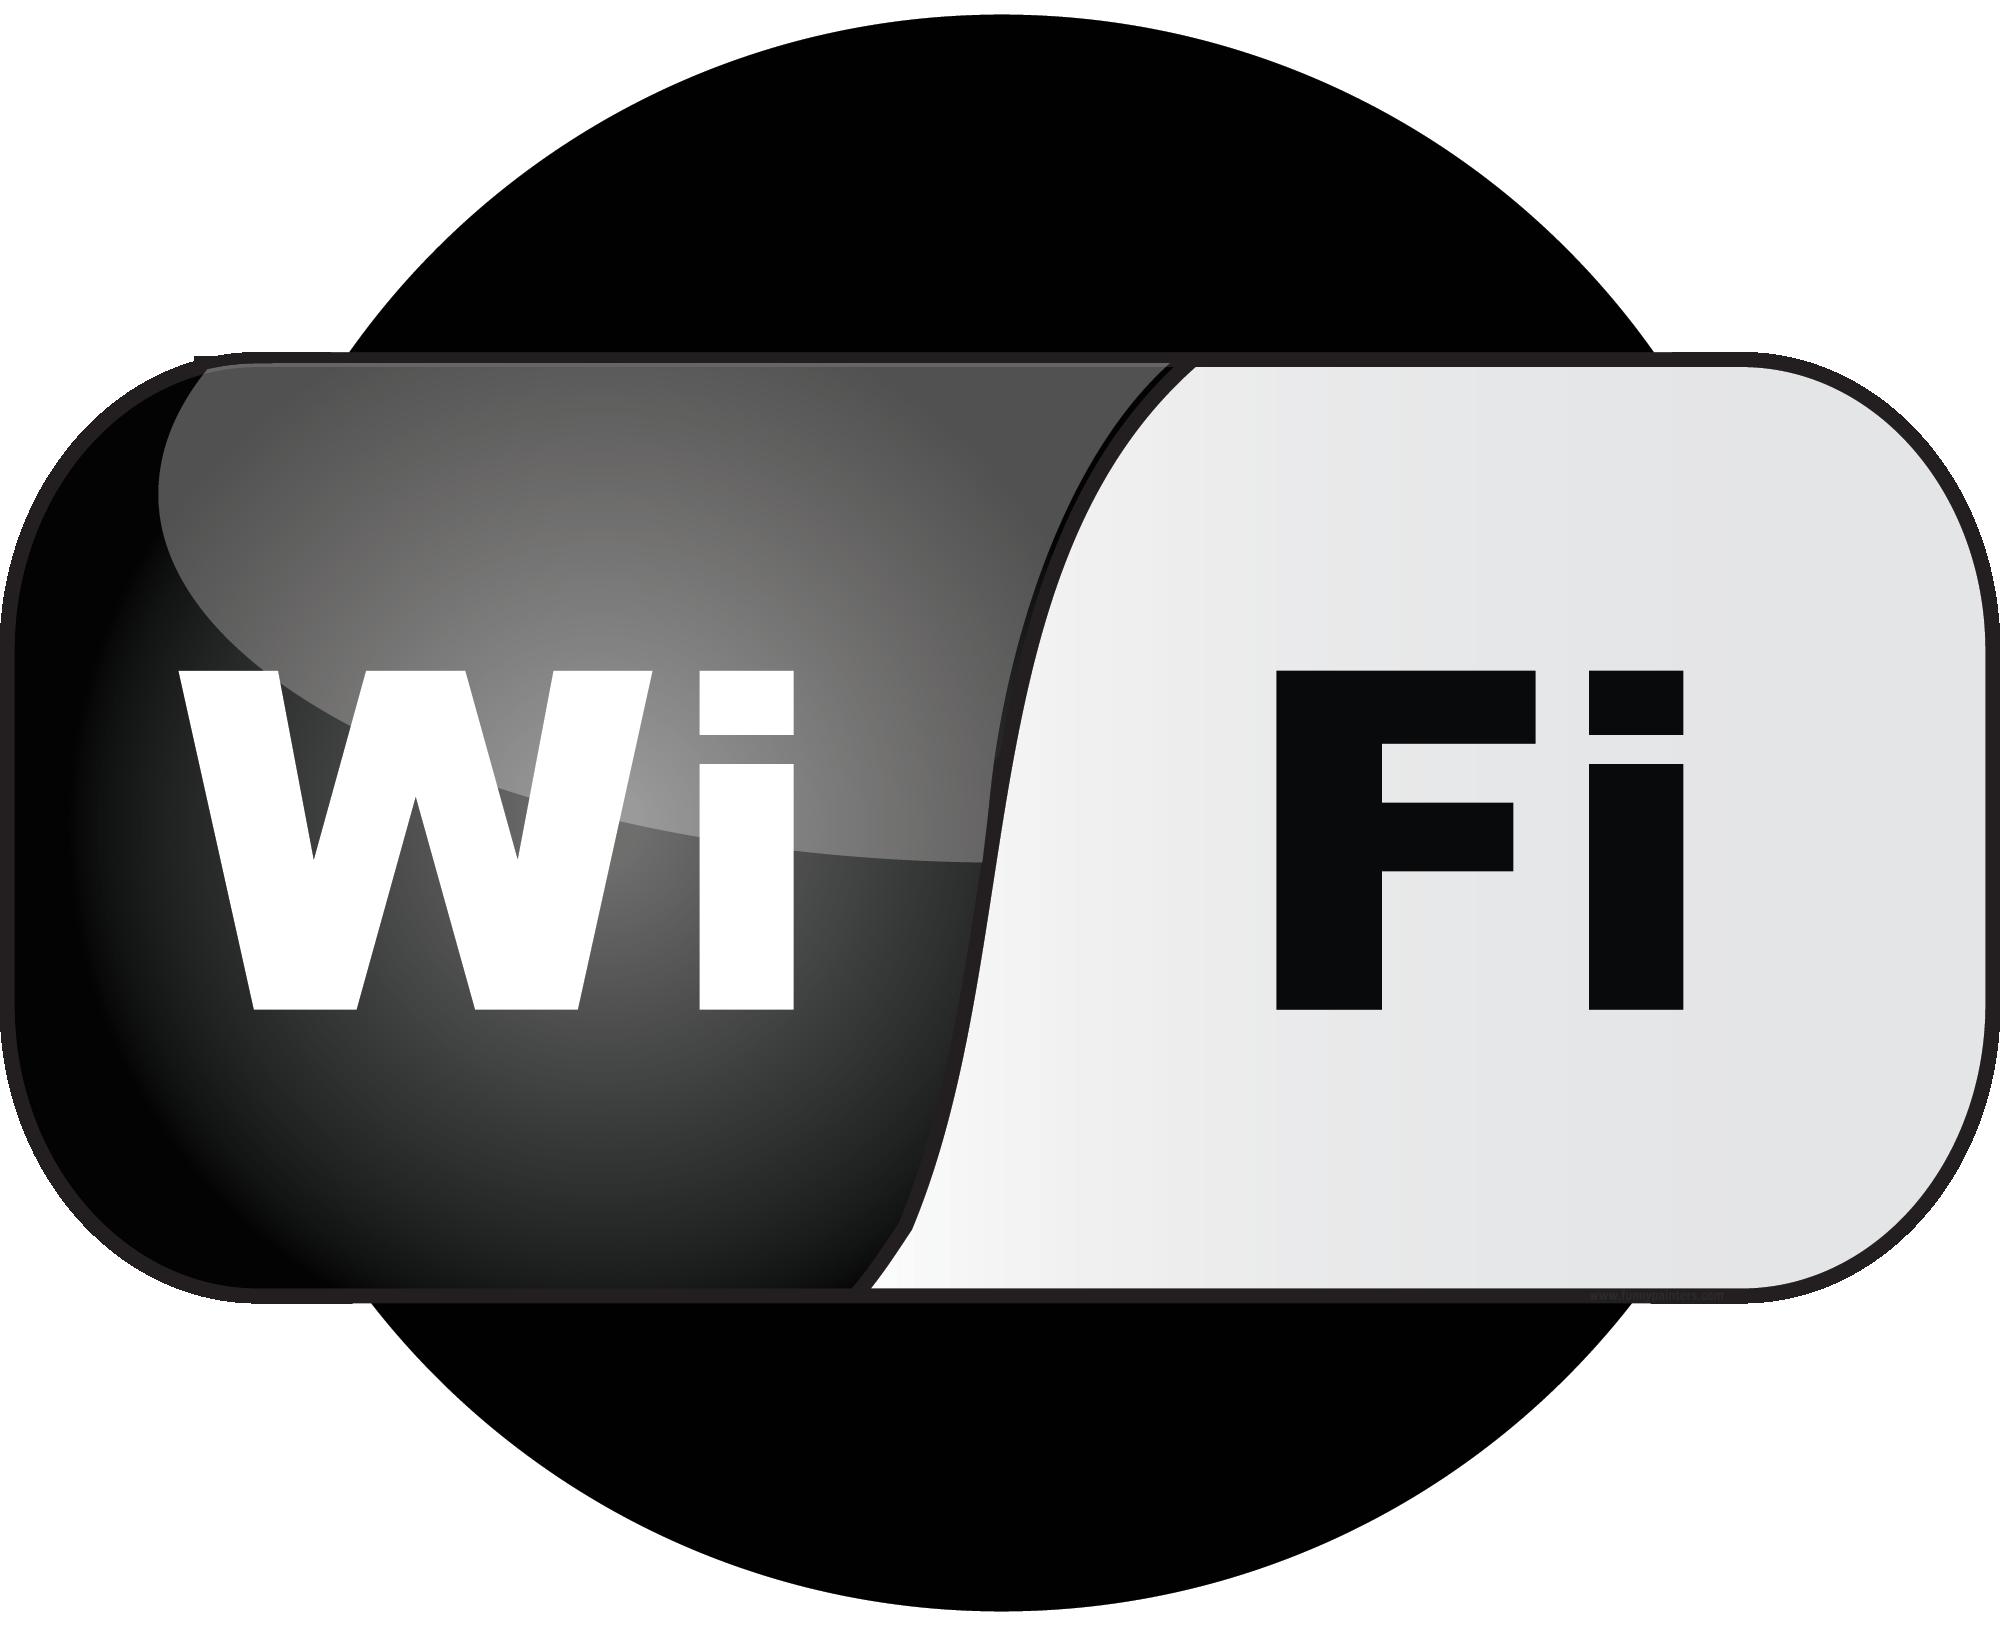 Wifi PNG - 18458